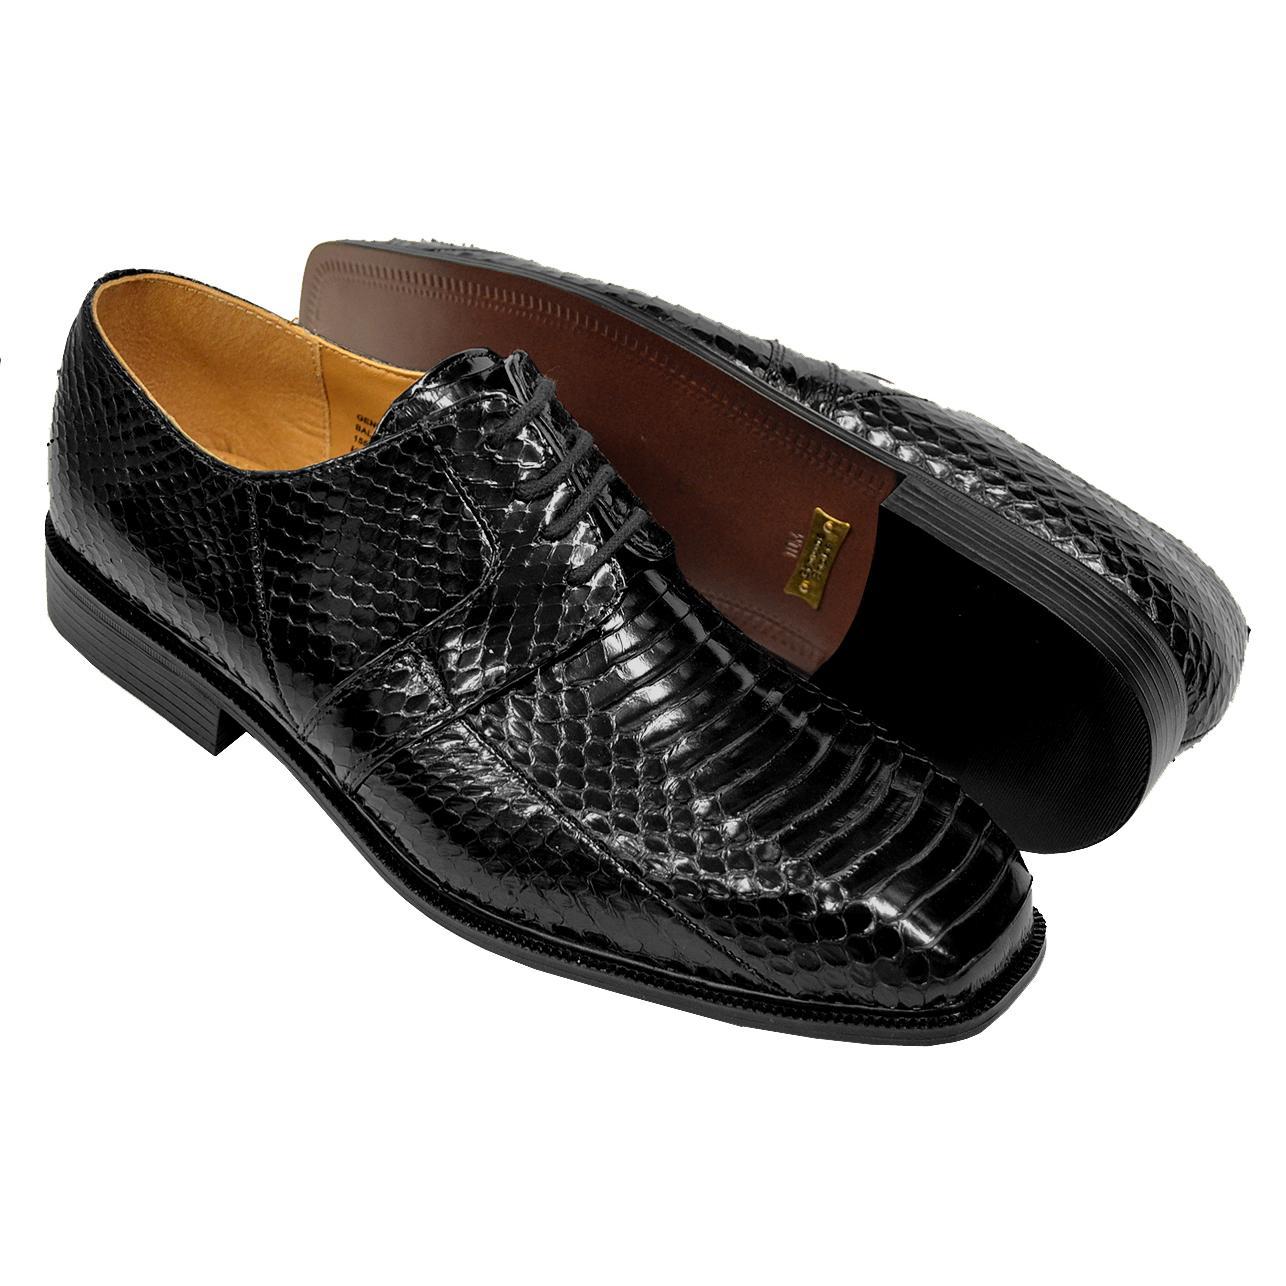 Genuine Snake Skin Shoes 155221